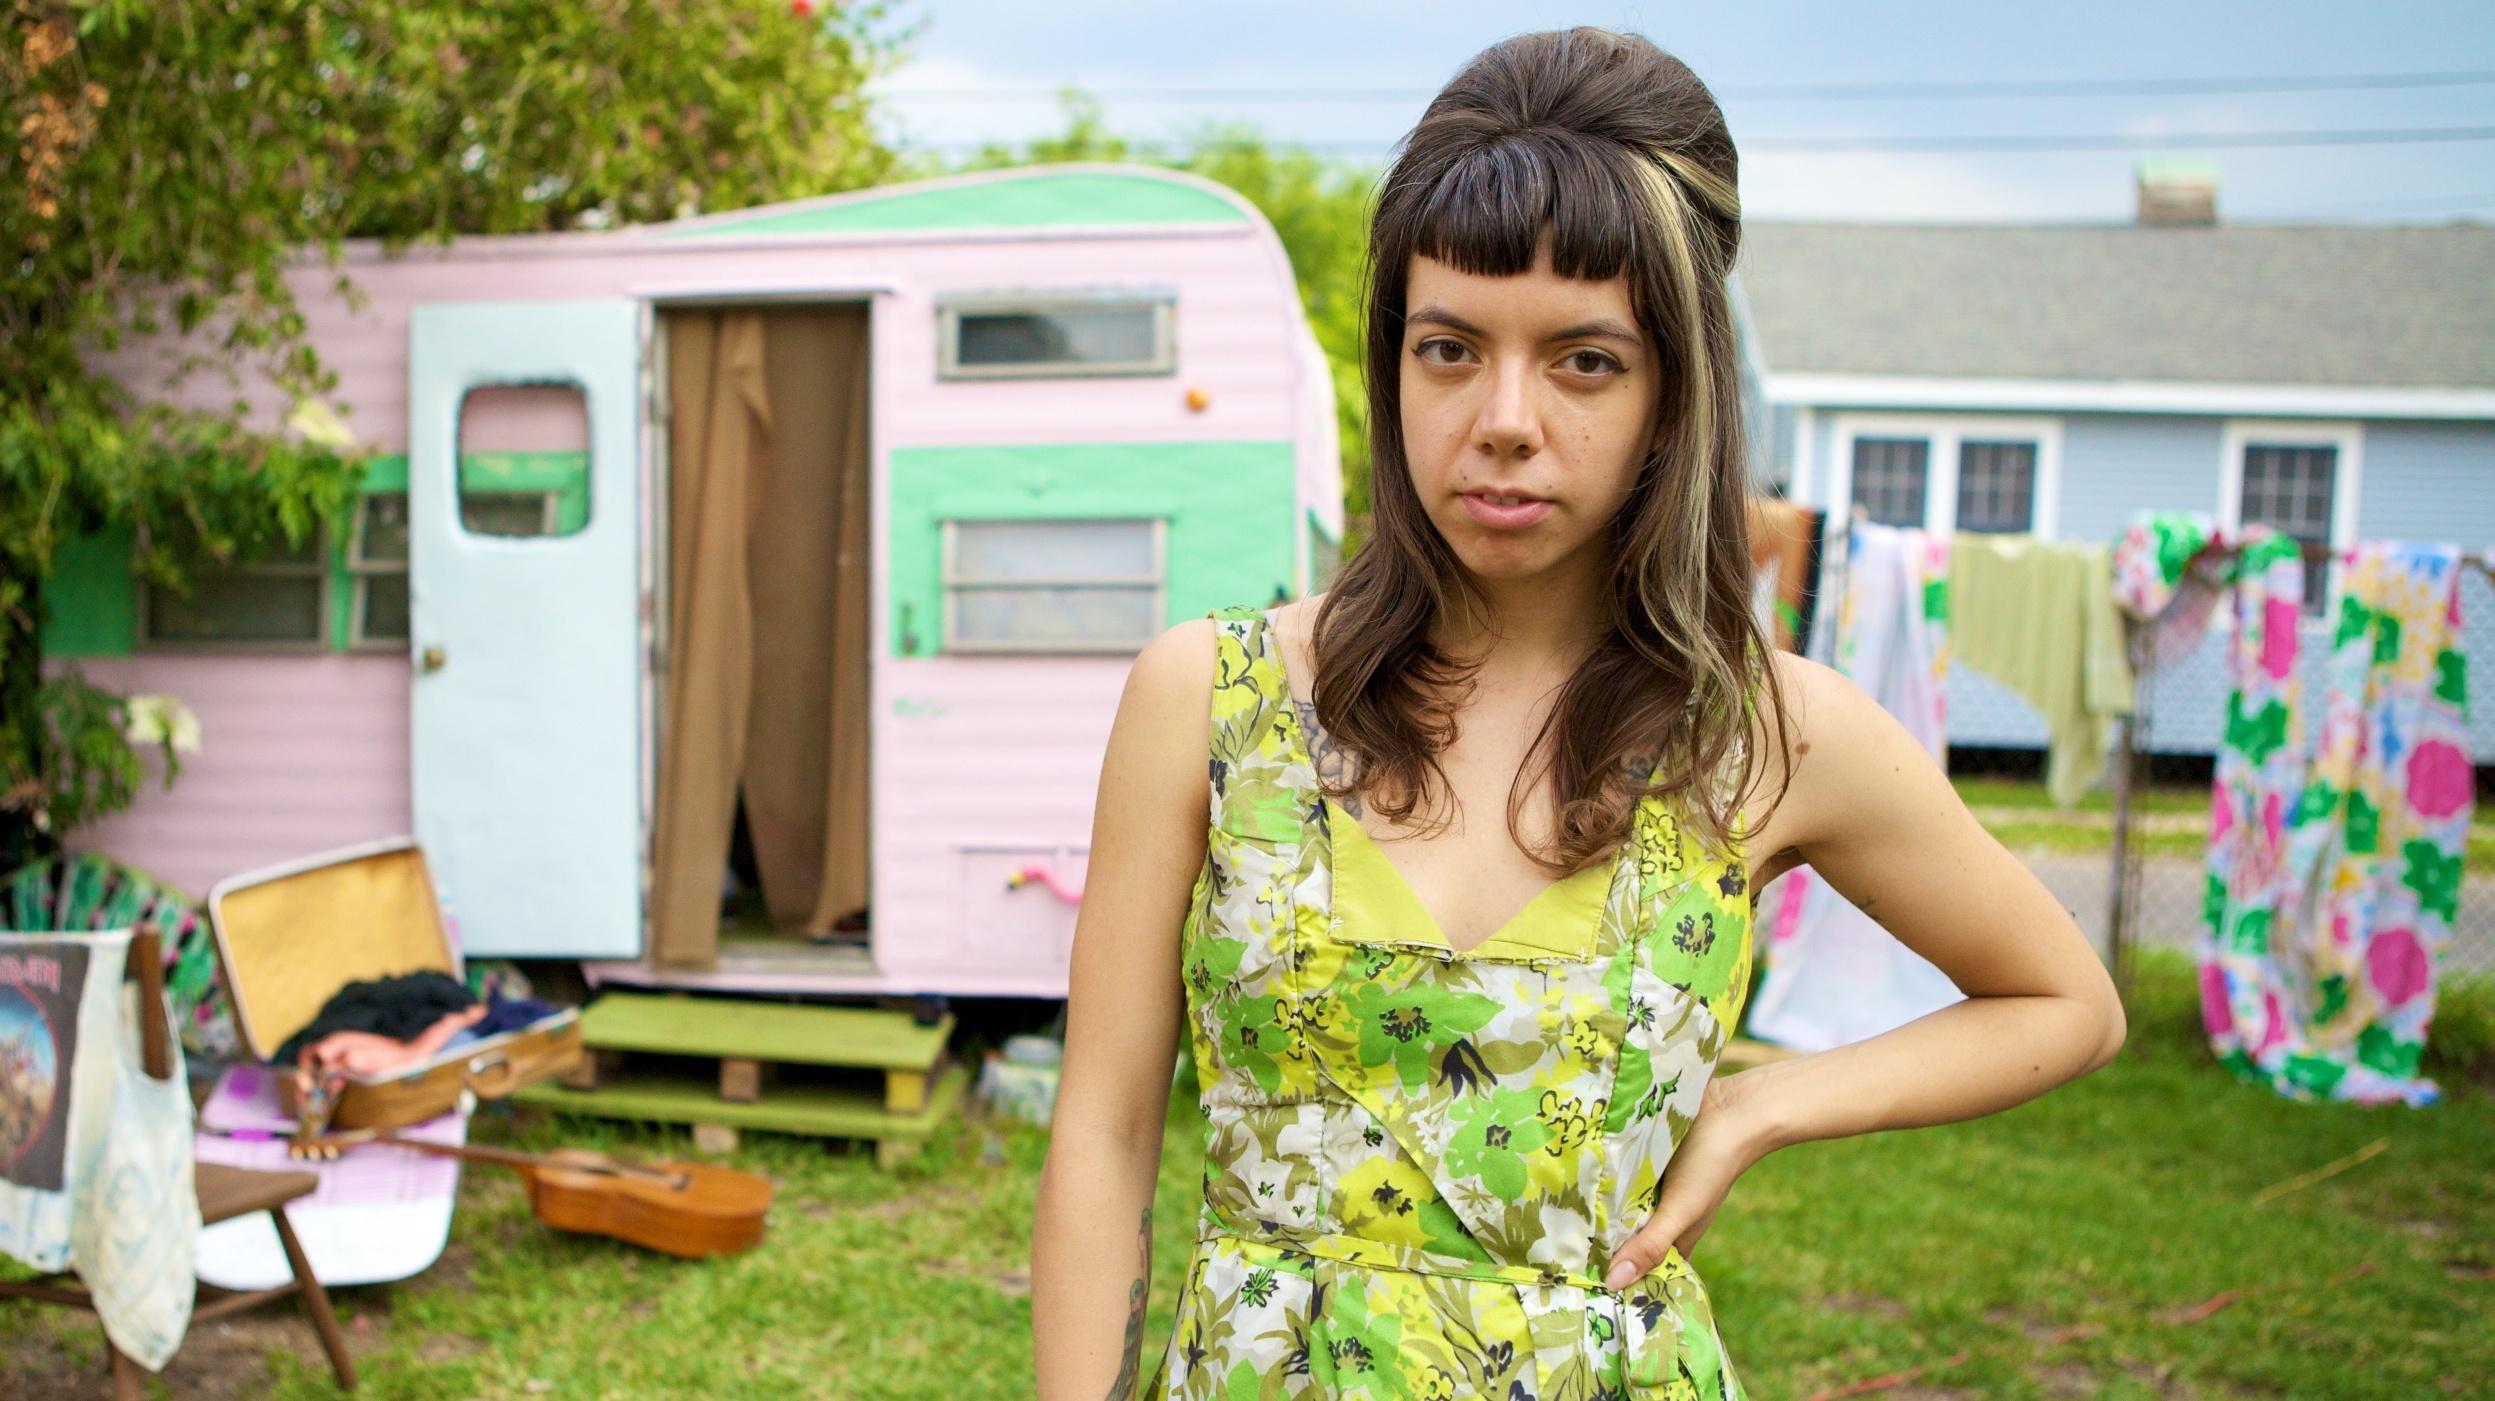 5 New Faces Of Folk, At The 2013 Newport Folk Festival